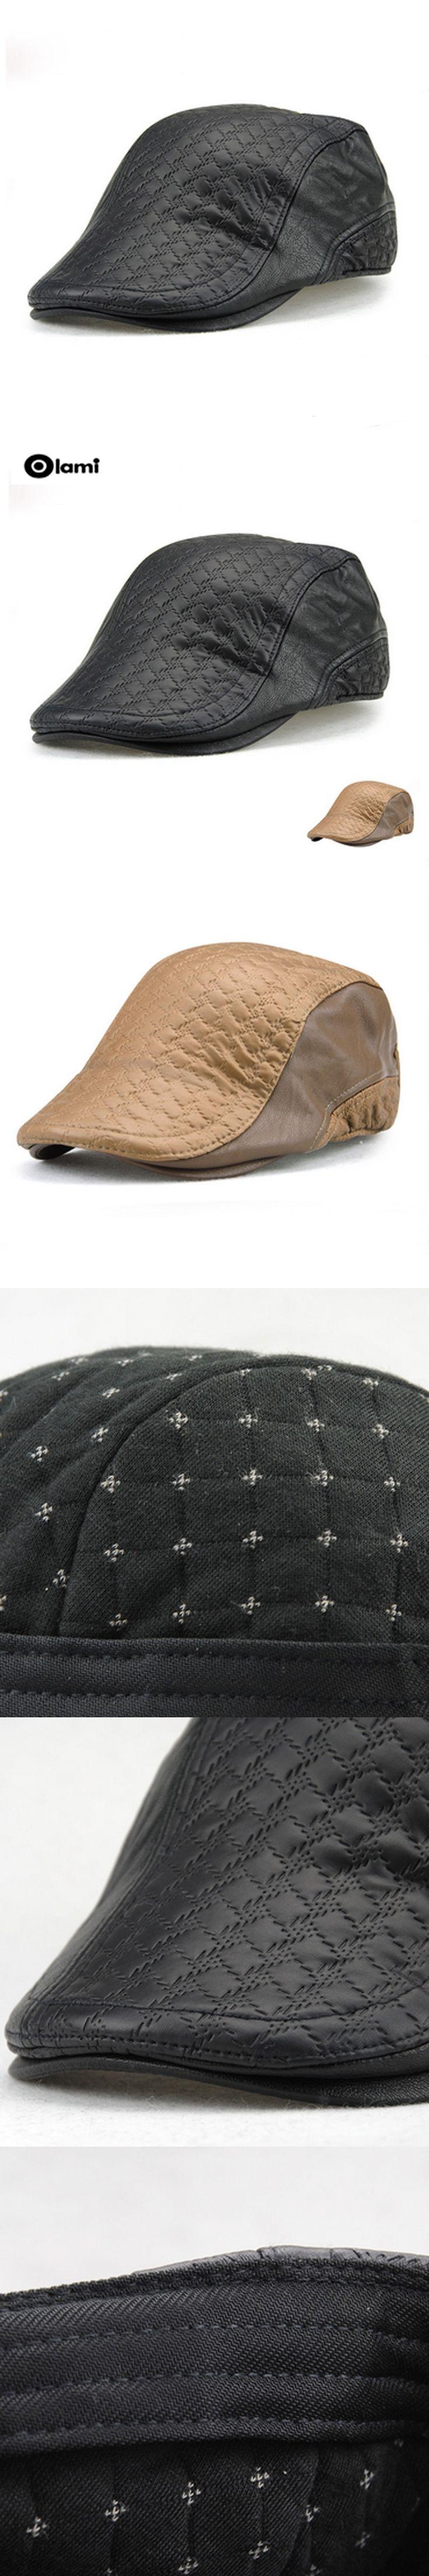 Olami Fashion Winter Beret Cap sway cap Hats for Men and Women's Visors cap Gorras Flat Caps Berets Wholesale 9457-58